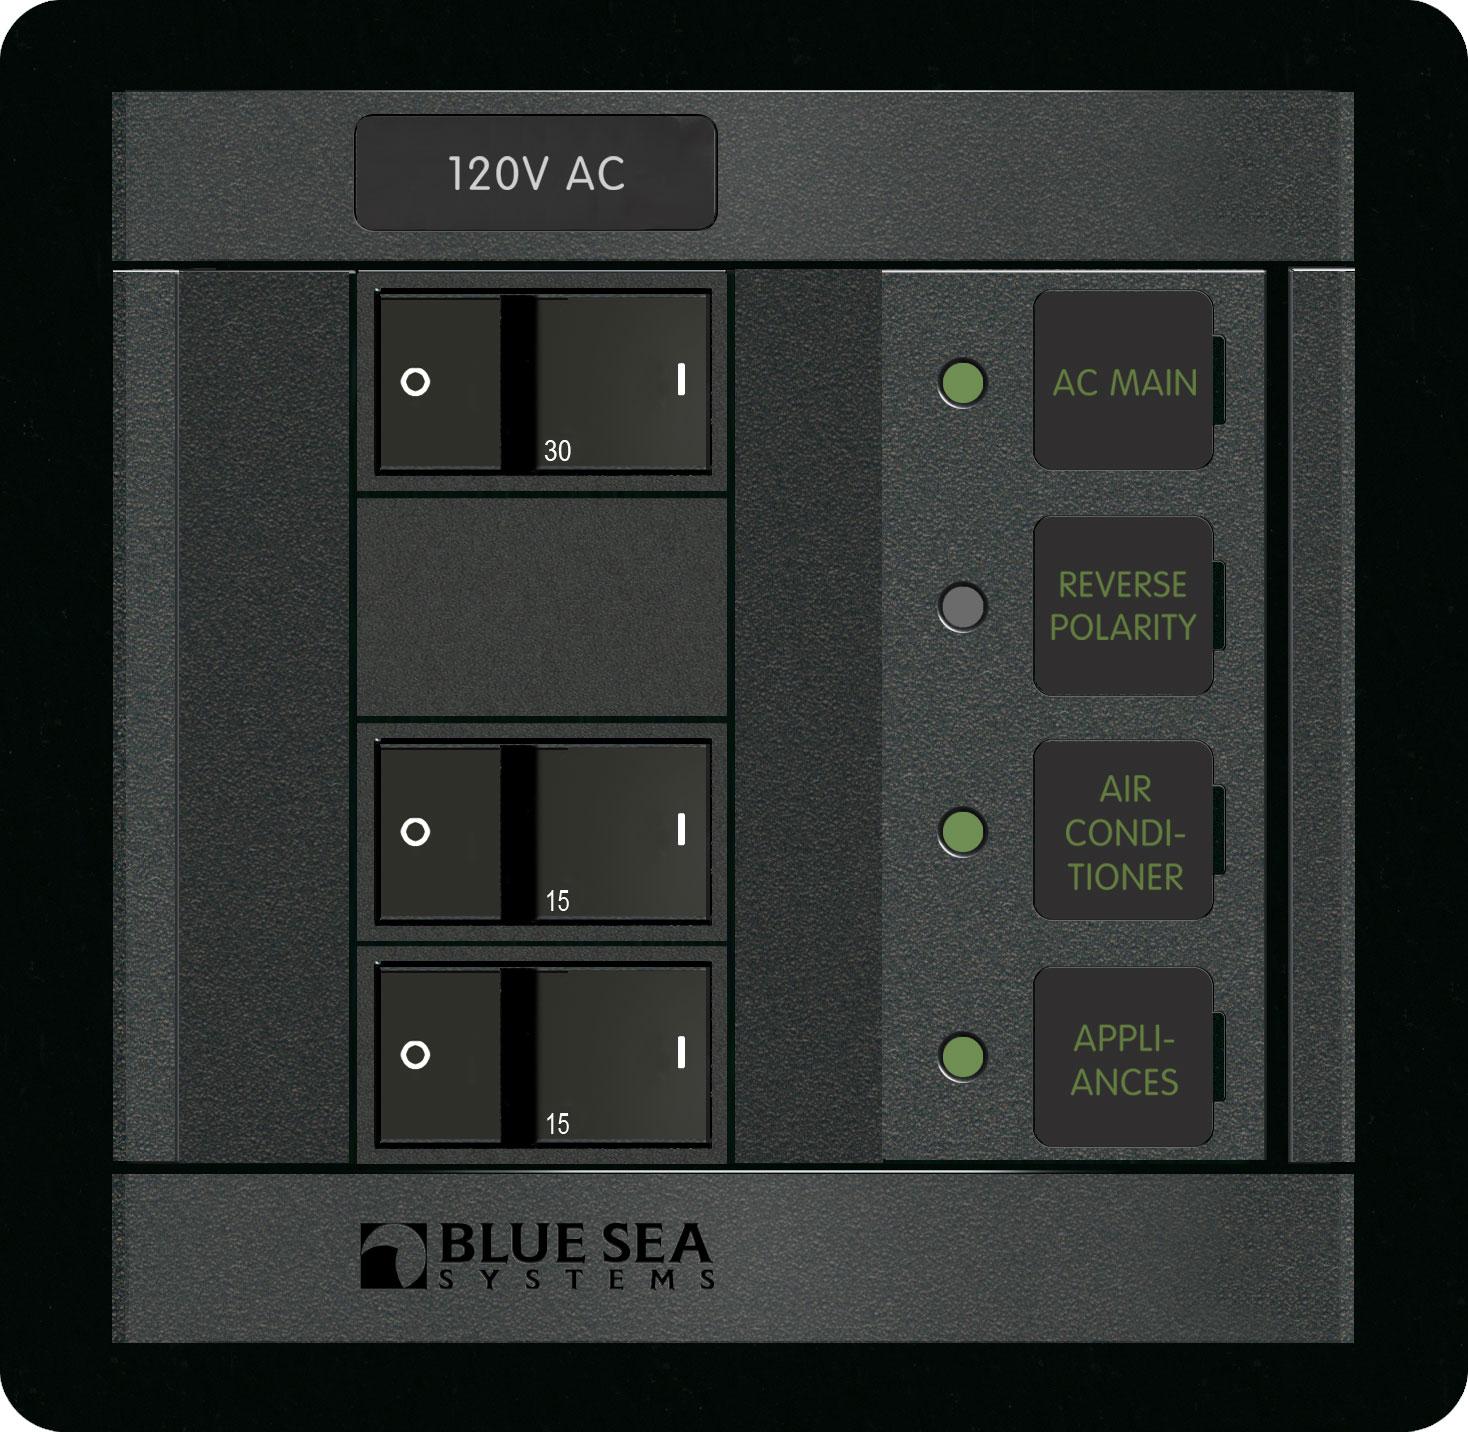 120 Volt AC Main + 2 Positions - Blue Sea Systems